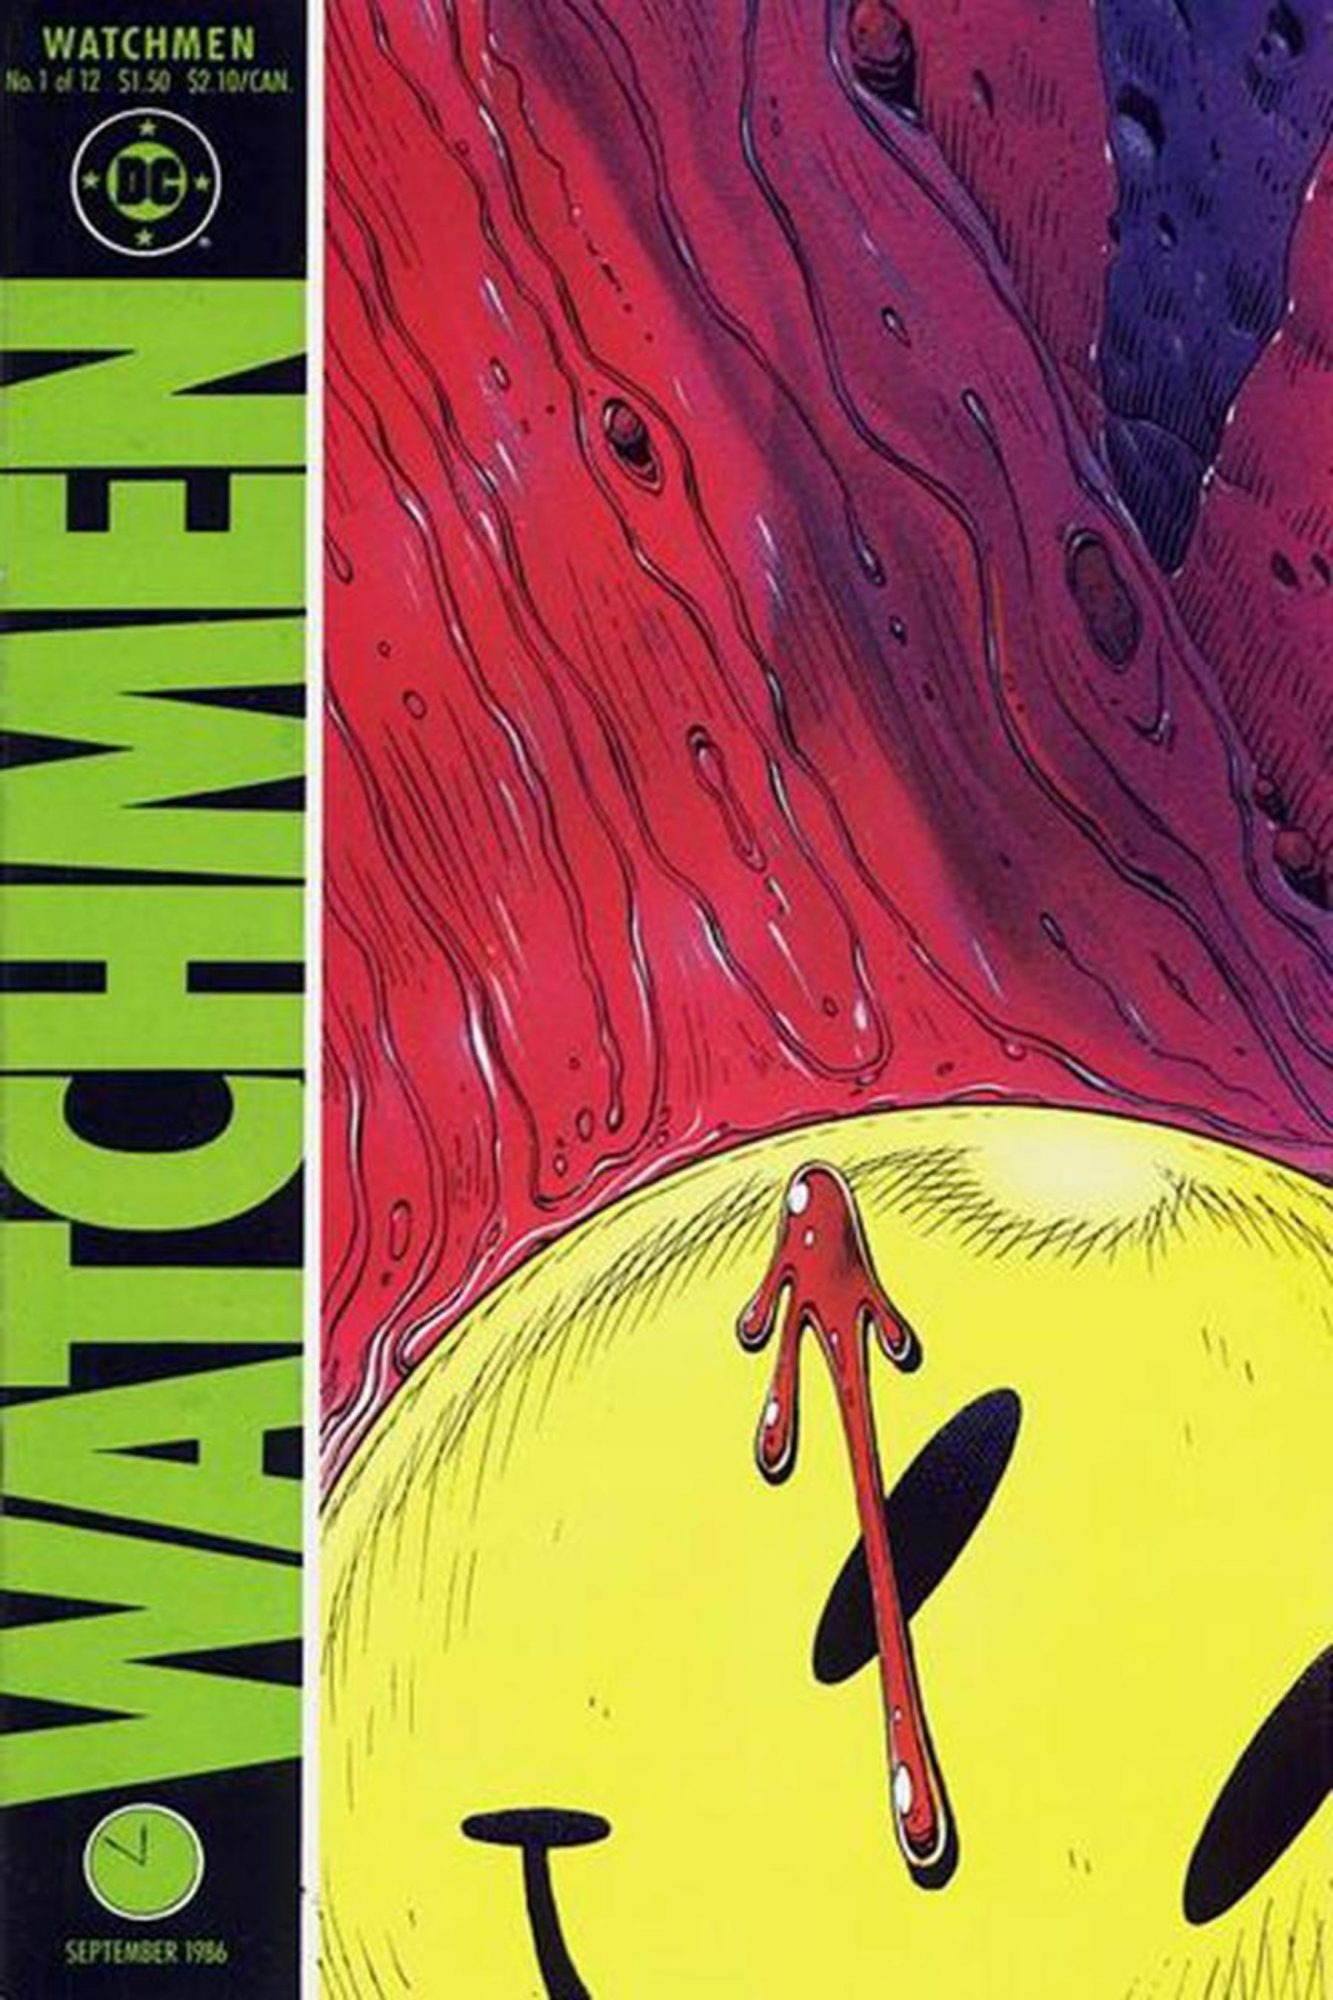 Watchmen # 1 Comic (1986)